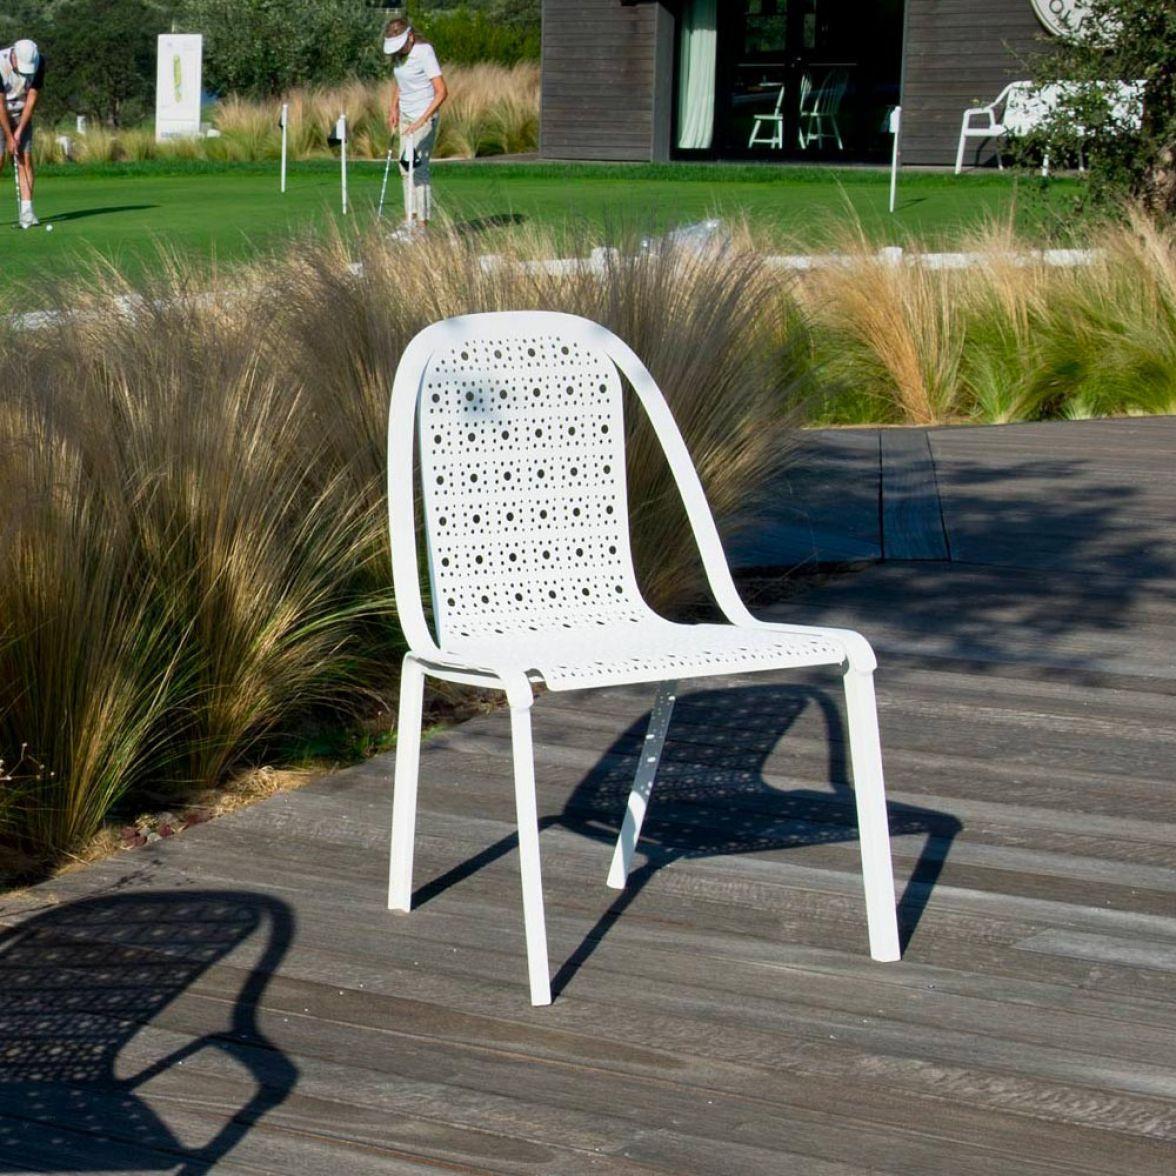 Tline chair